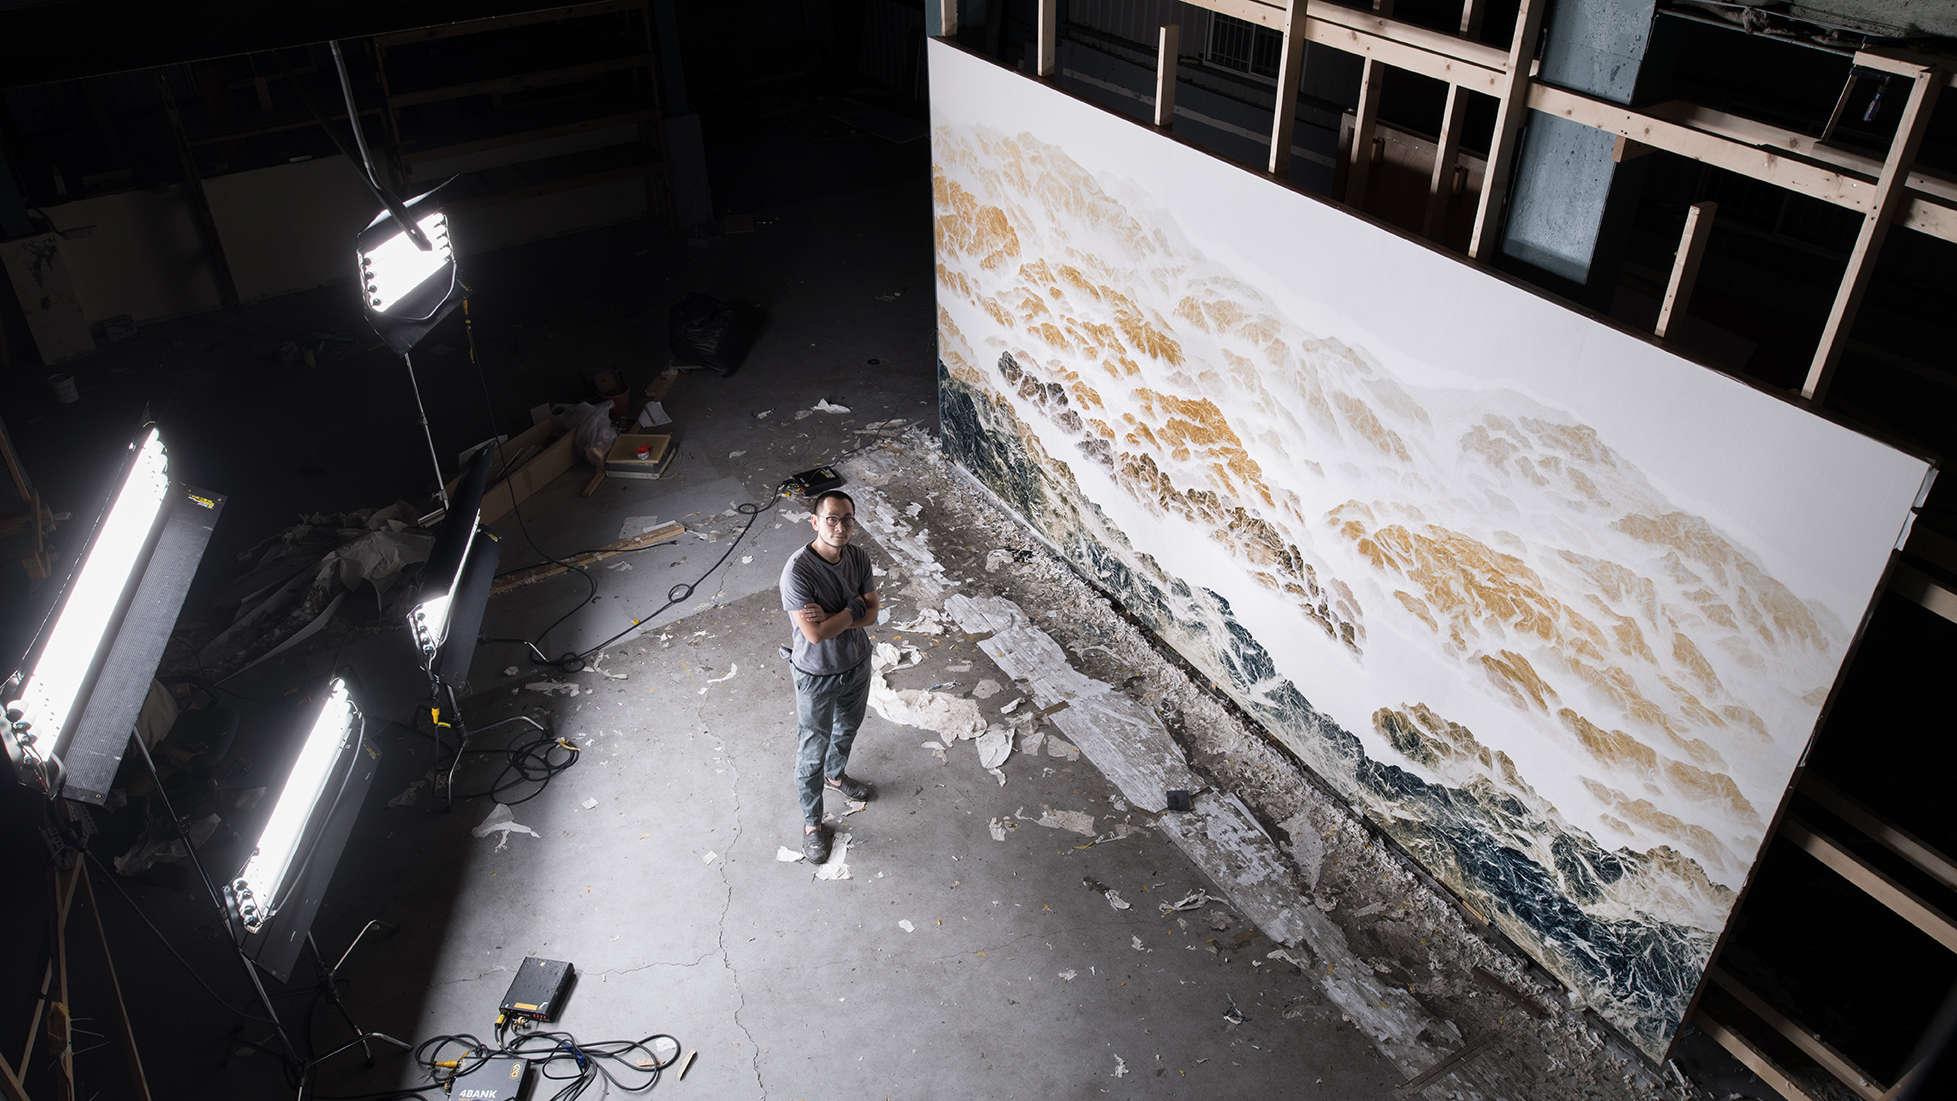 Wu Chi Tsung ARTISTA TAIWANES